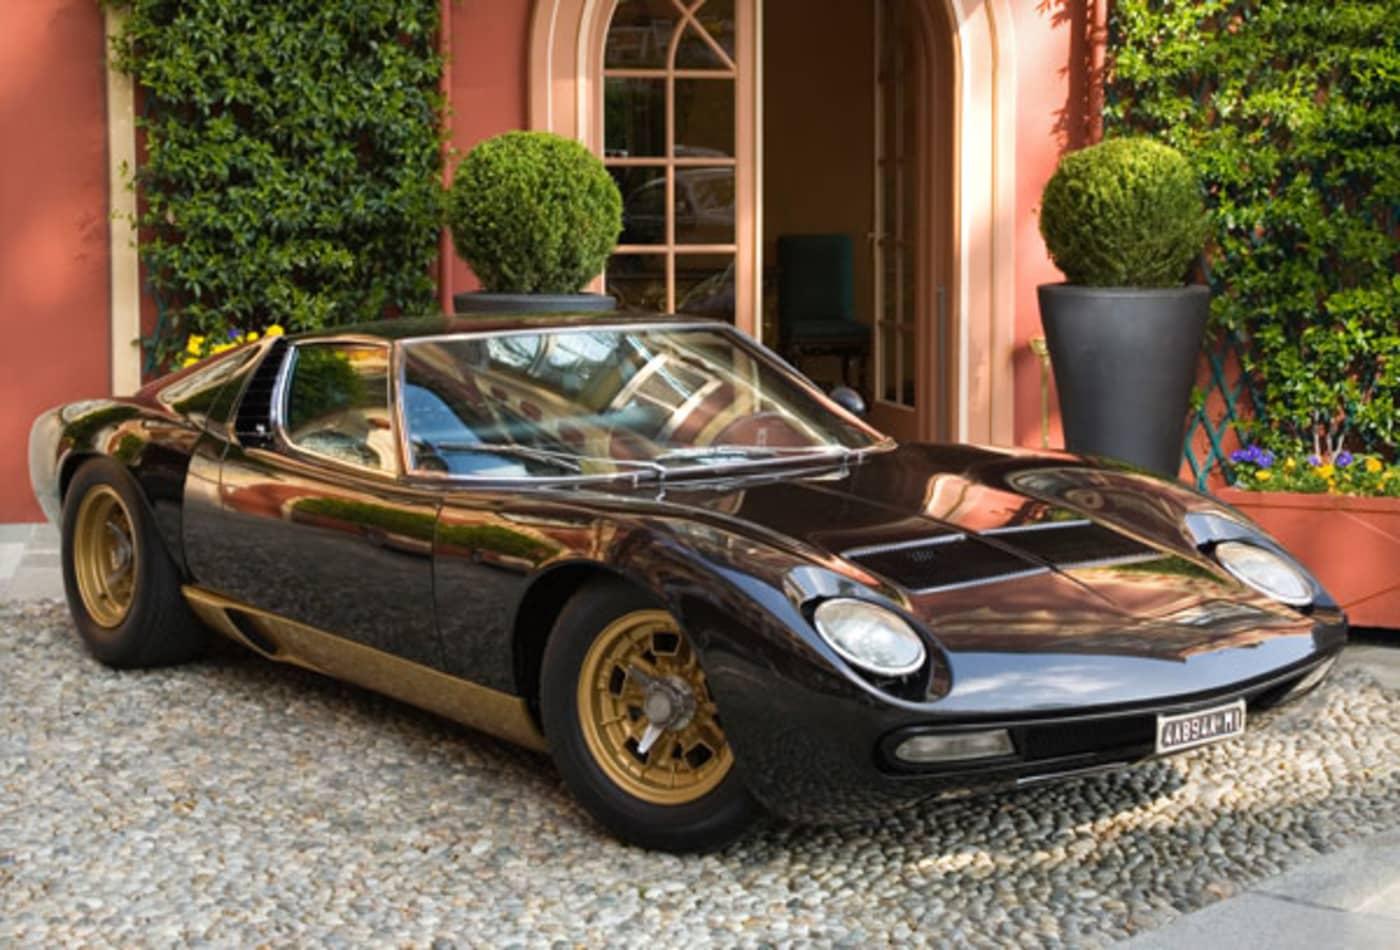 48705396 Lamborghini-Miura-SV-Top-10-Best-Looking-Cars-All-Time-CNBC.jpg